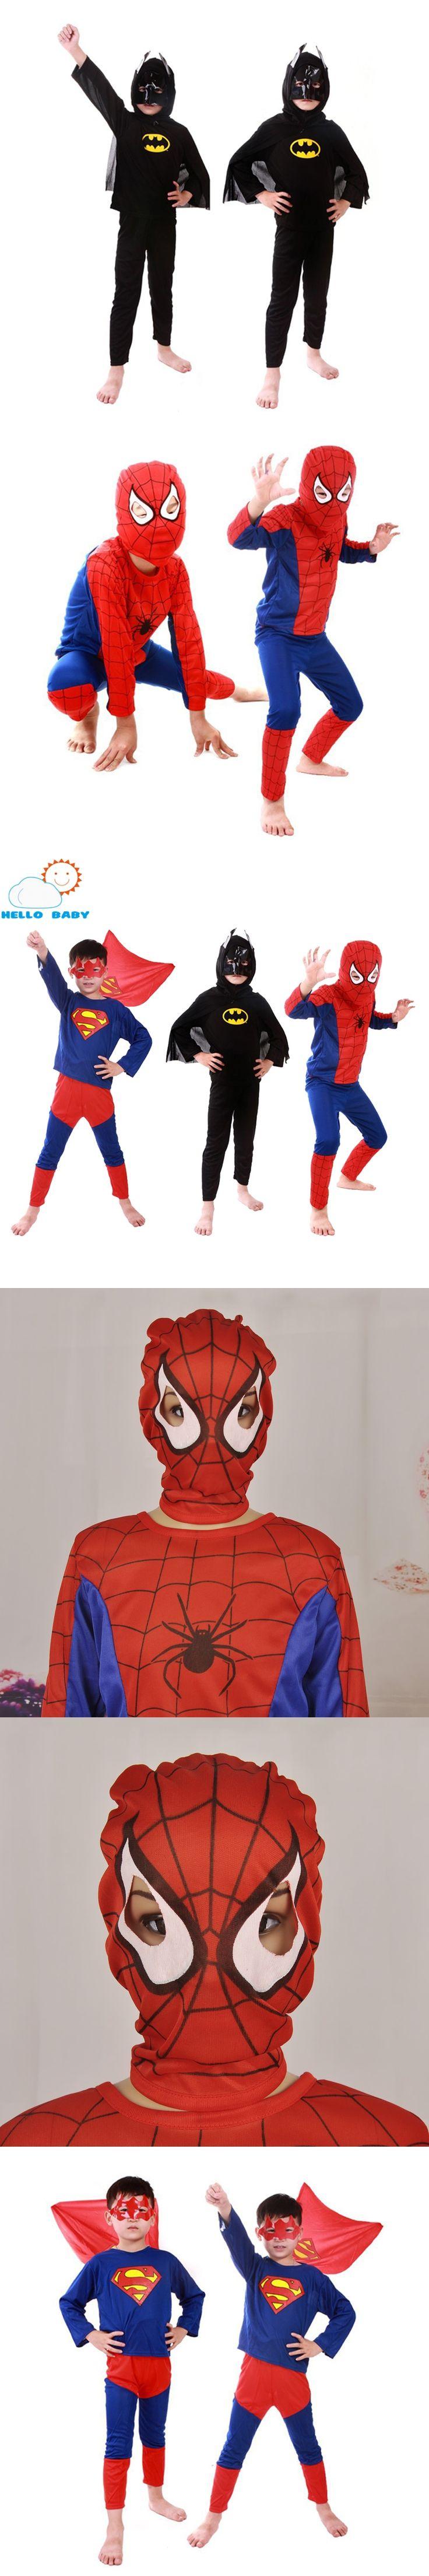 2017 Spiderman Batman Superman Children's Birthday Halloween Party Superhero Costumes Cloths Boys Children Costume Cape For Kids